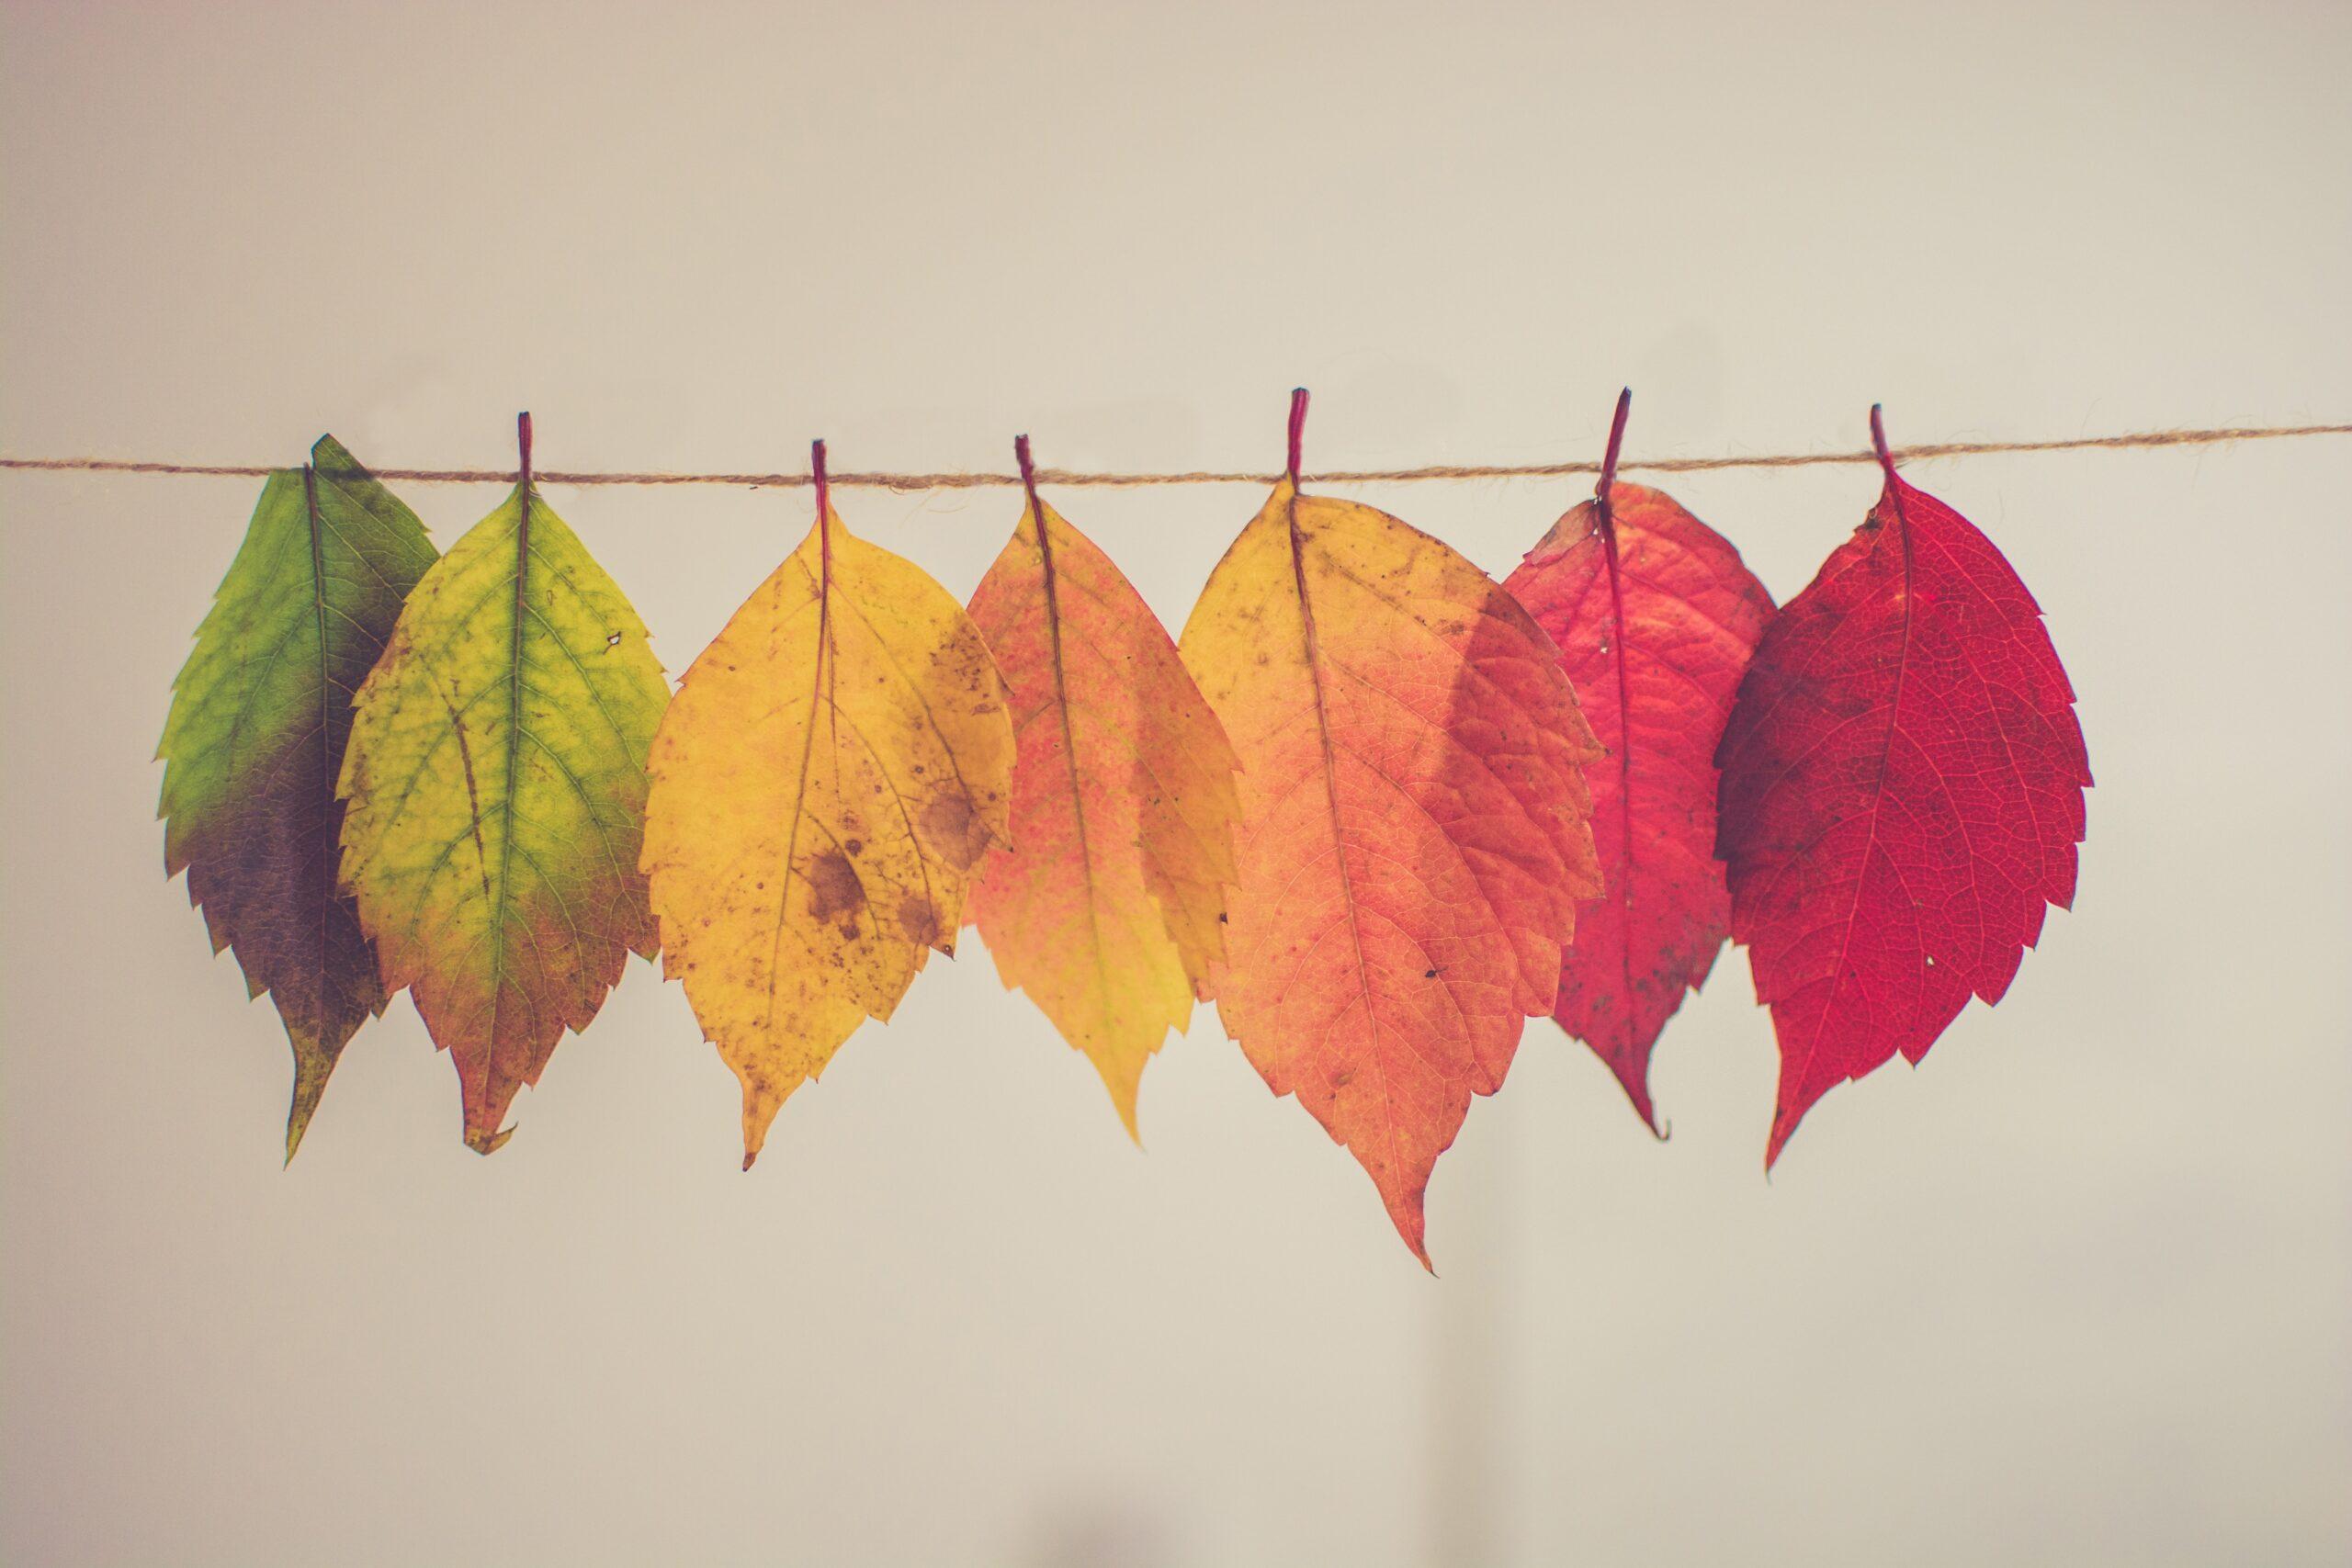 The Art of Managing Change